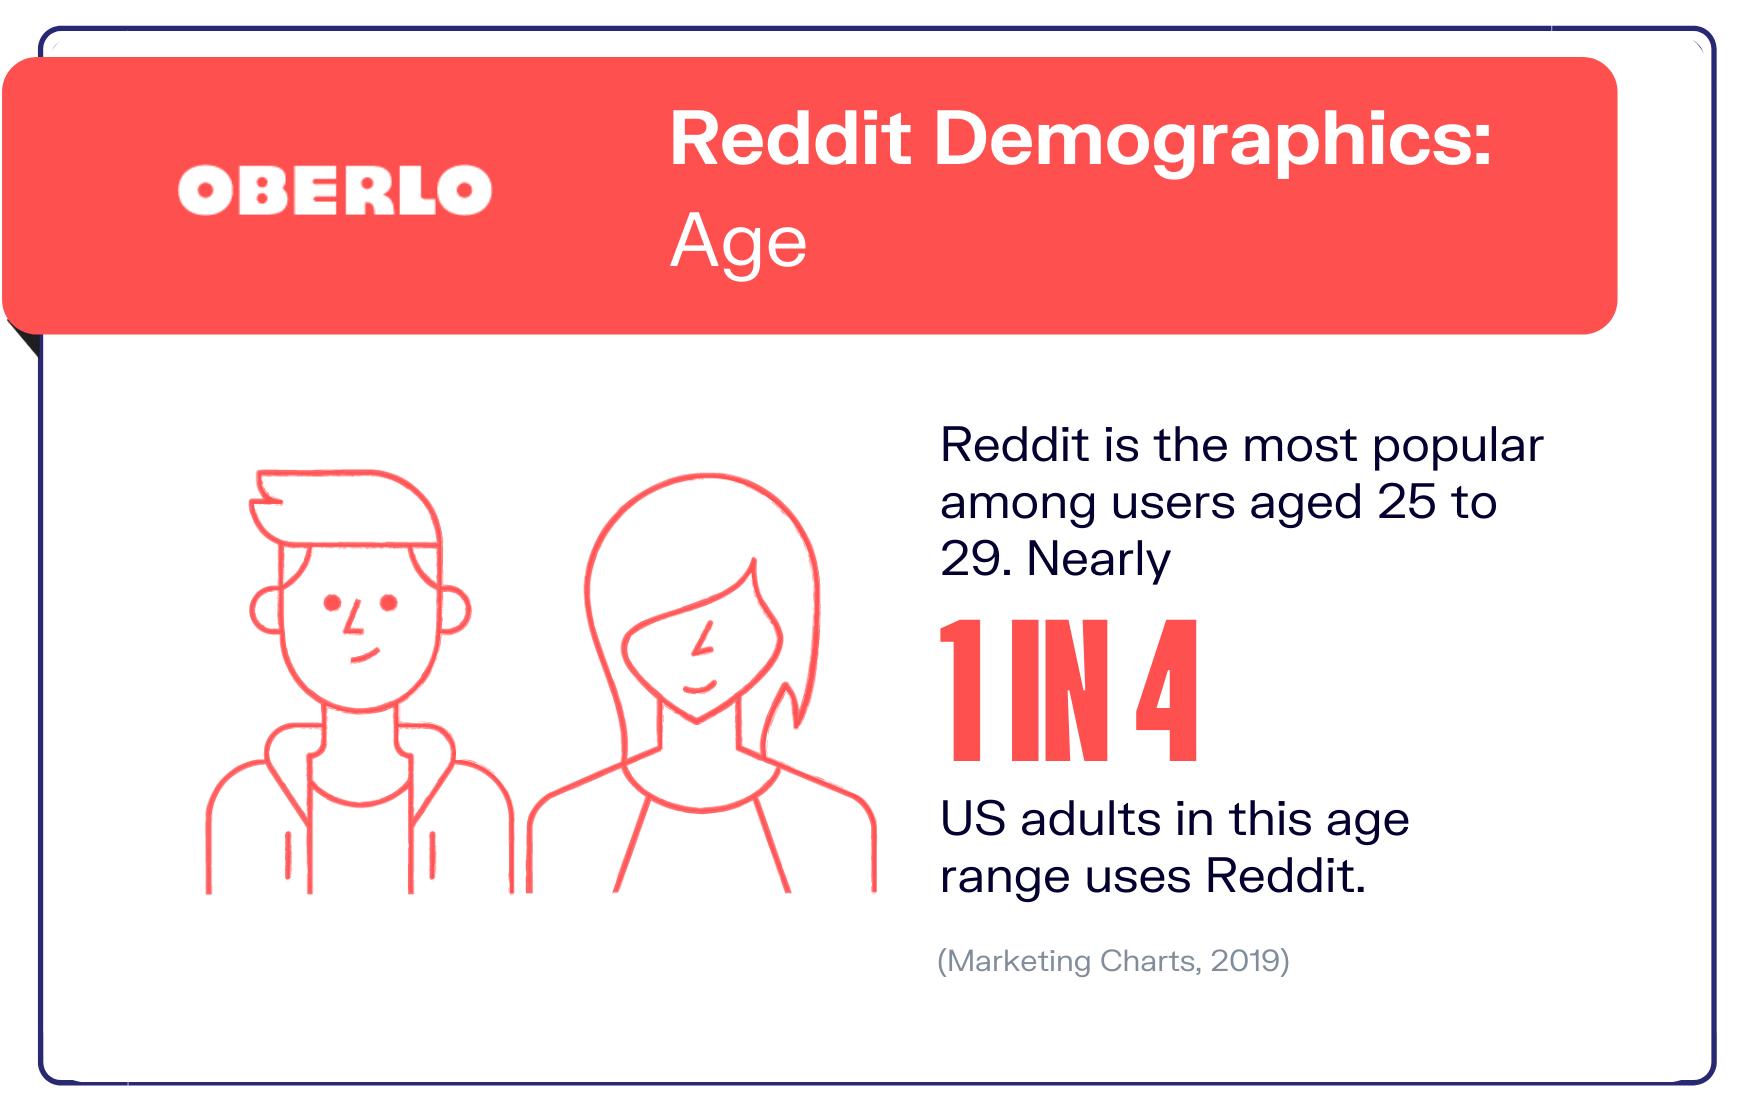 graphic of reddit statistic #5